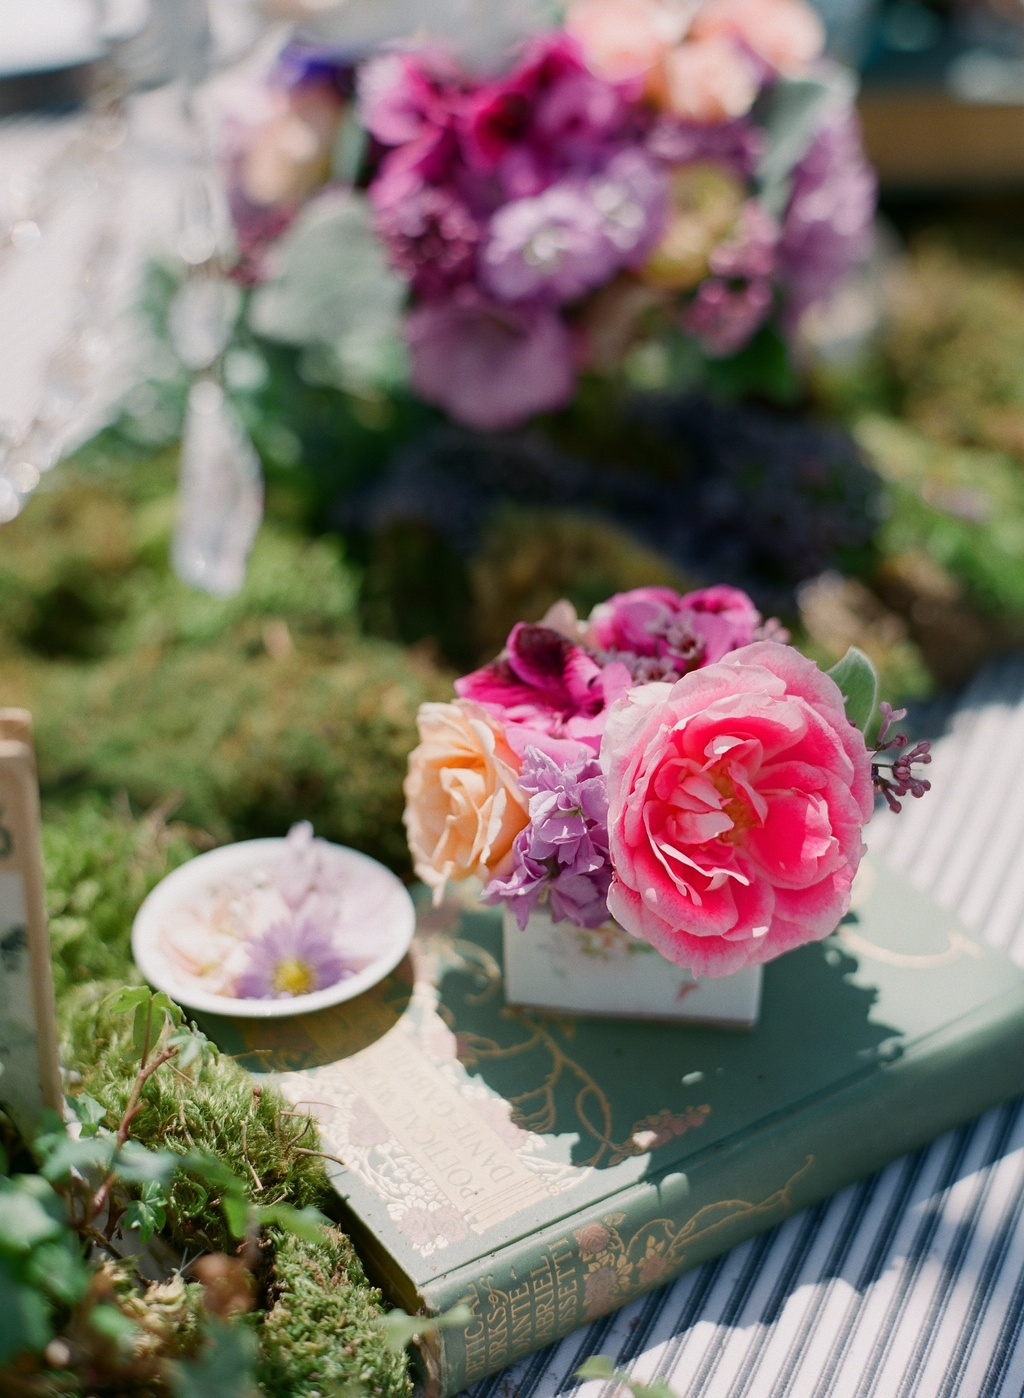 Styled-wedding-beaux-arts-tea-time-monique-lhuillier-santa-barbara-chic-flowers-pink-purple-moss-276.full